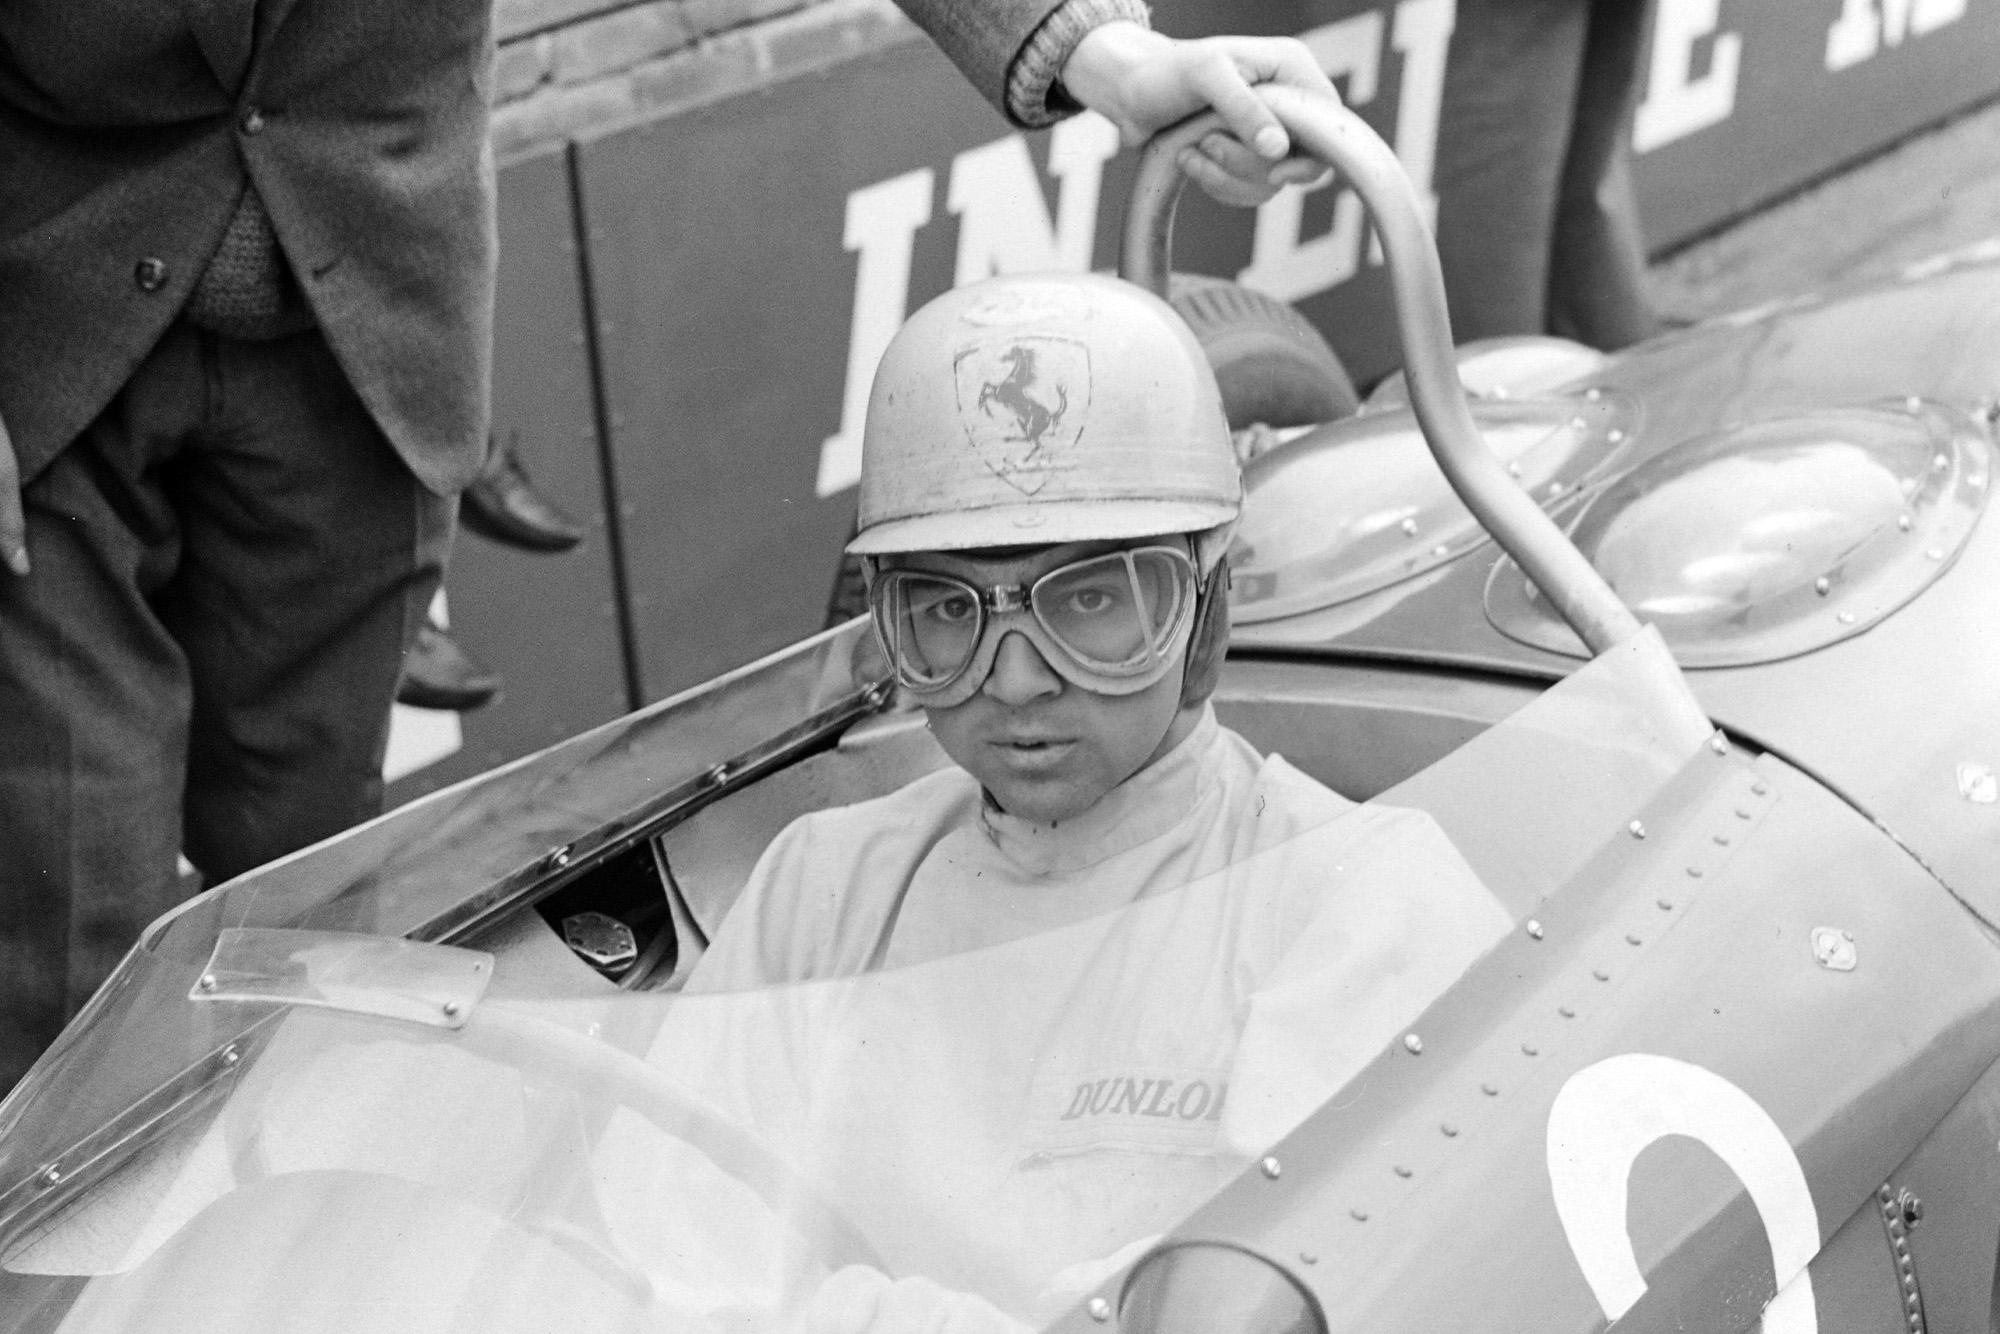 Ricardo Rodriguez was making his second Ferrari appearance